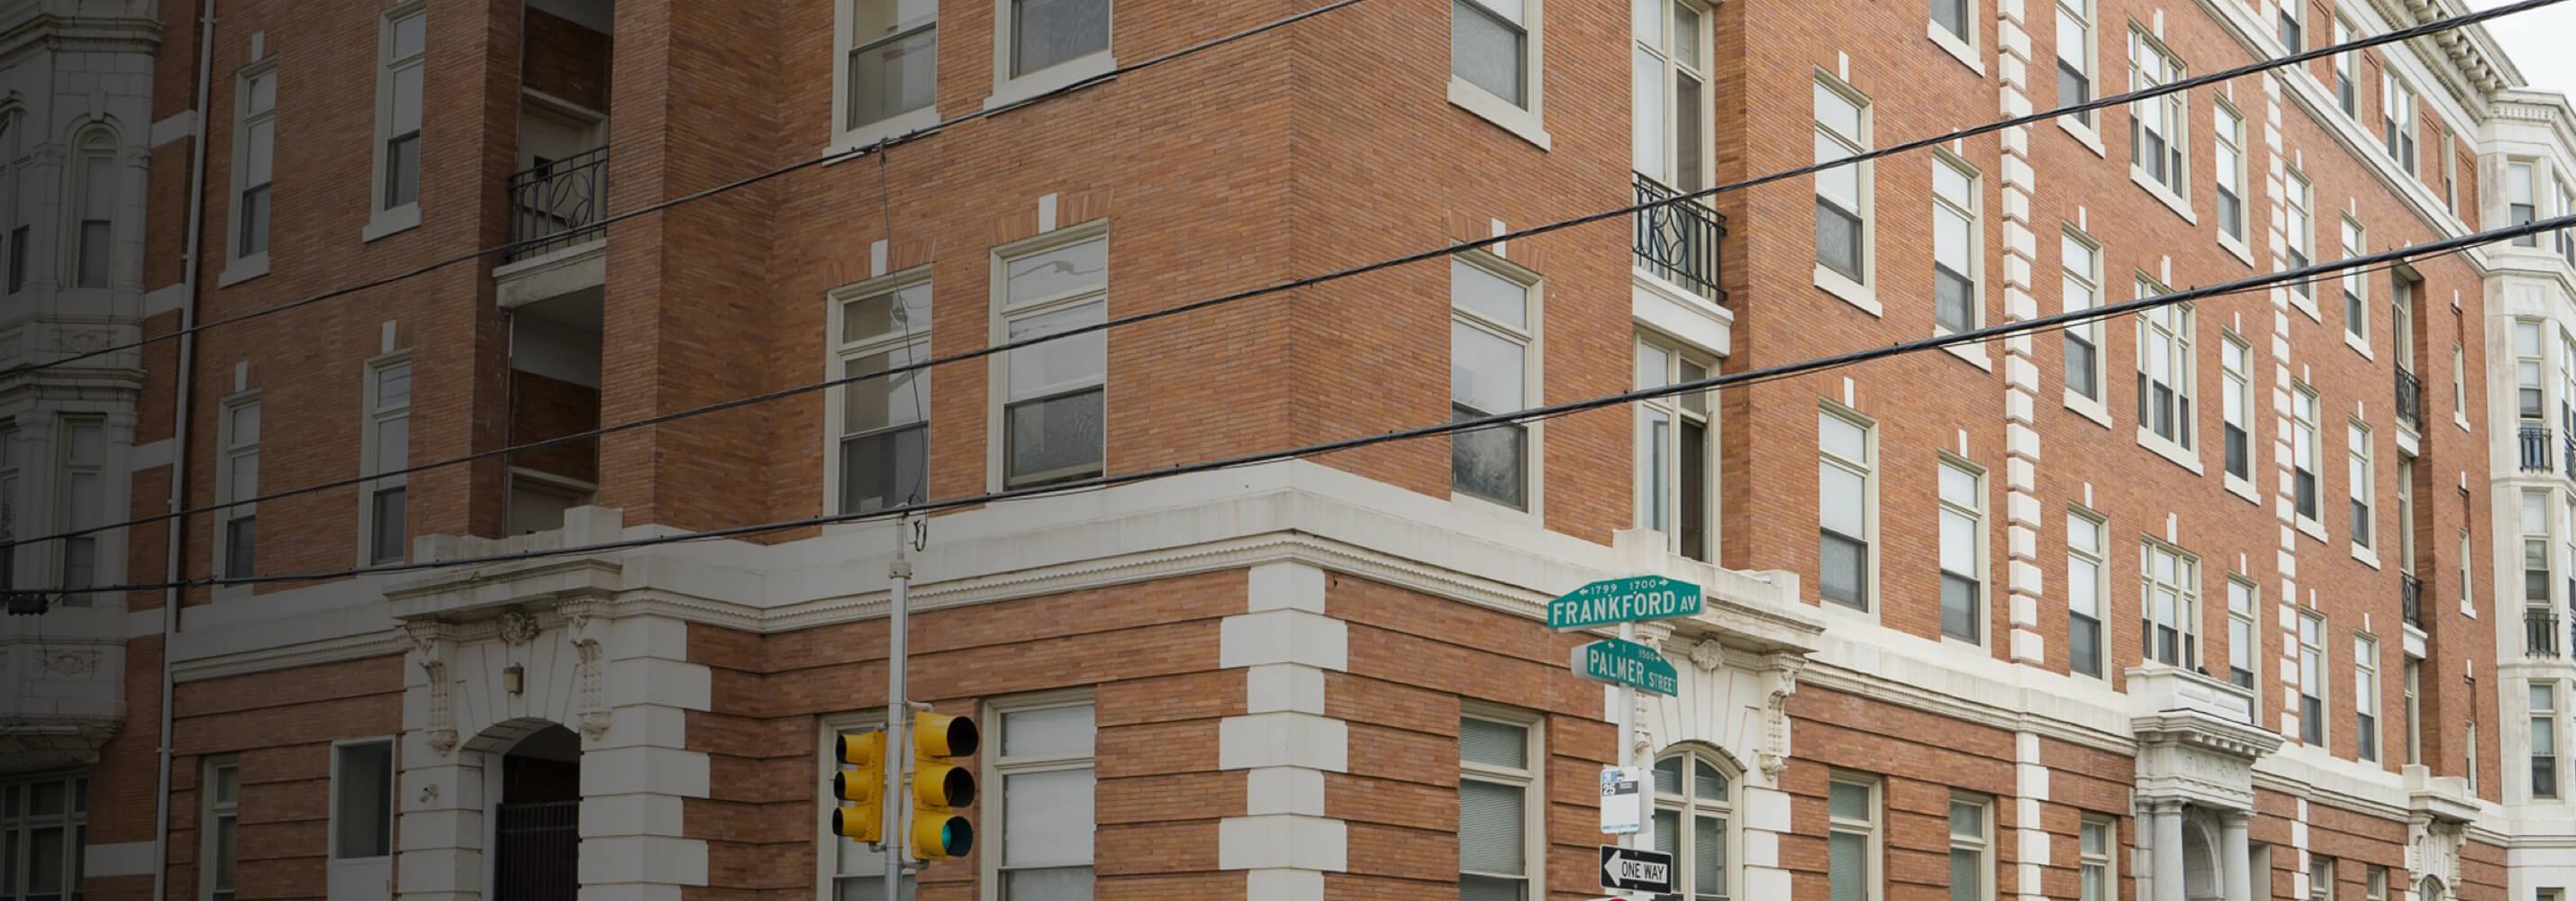 Neumann Senior Apartments